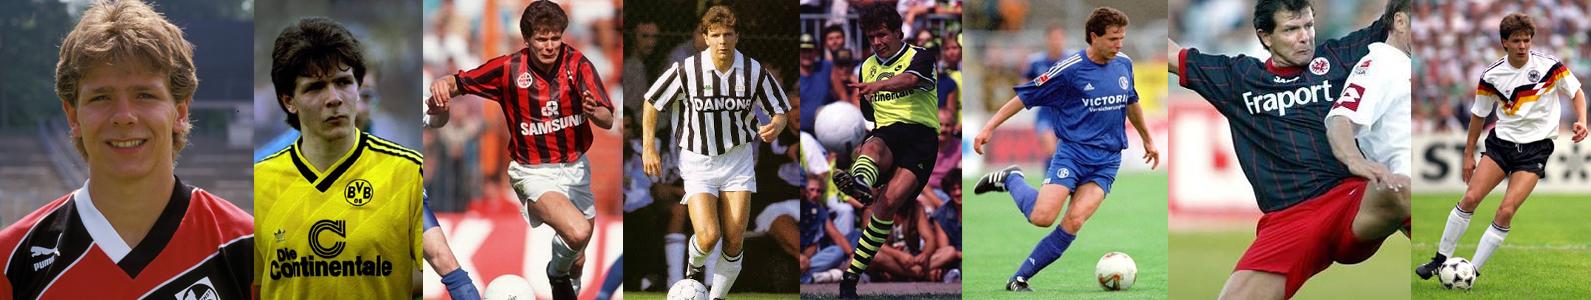 Eintracht Frankfurt (Part I) - Borussia Dortmund (Part I) - Eintracht Frankfurt (Part II) - Juventus - Borussia Dortmund (Part II) - Schalke 04 - Eintracht Frankfurt (Part III) - RFA - Click to enlarge